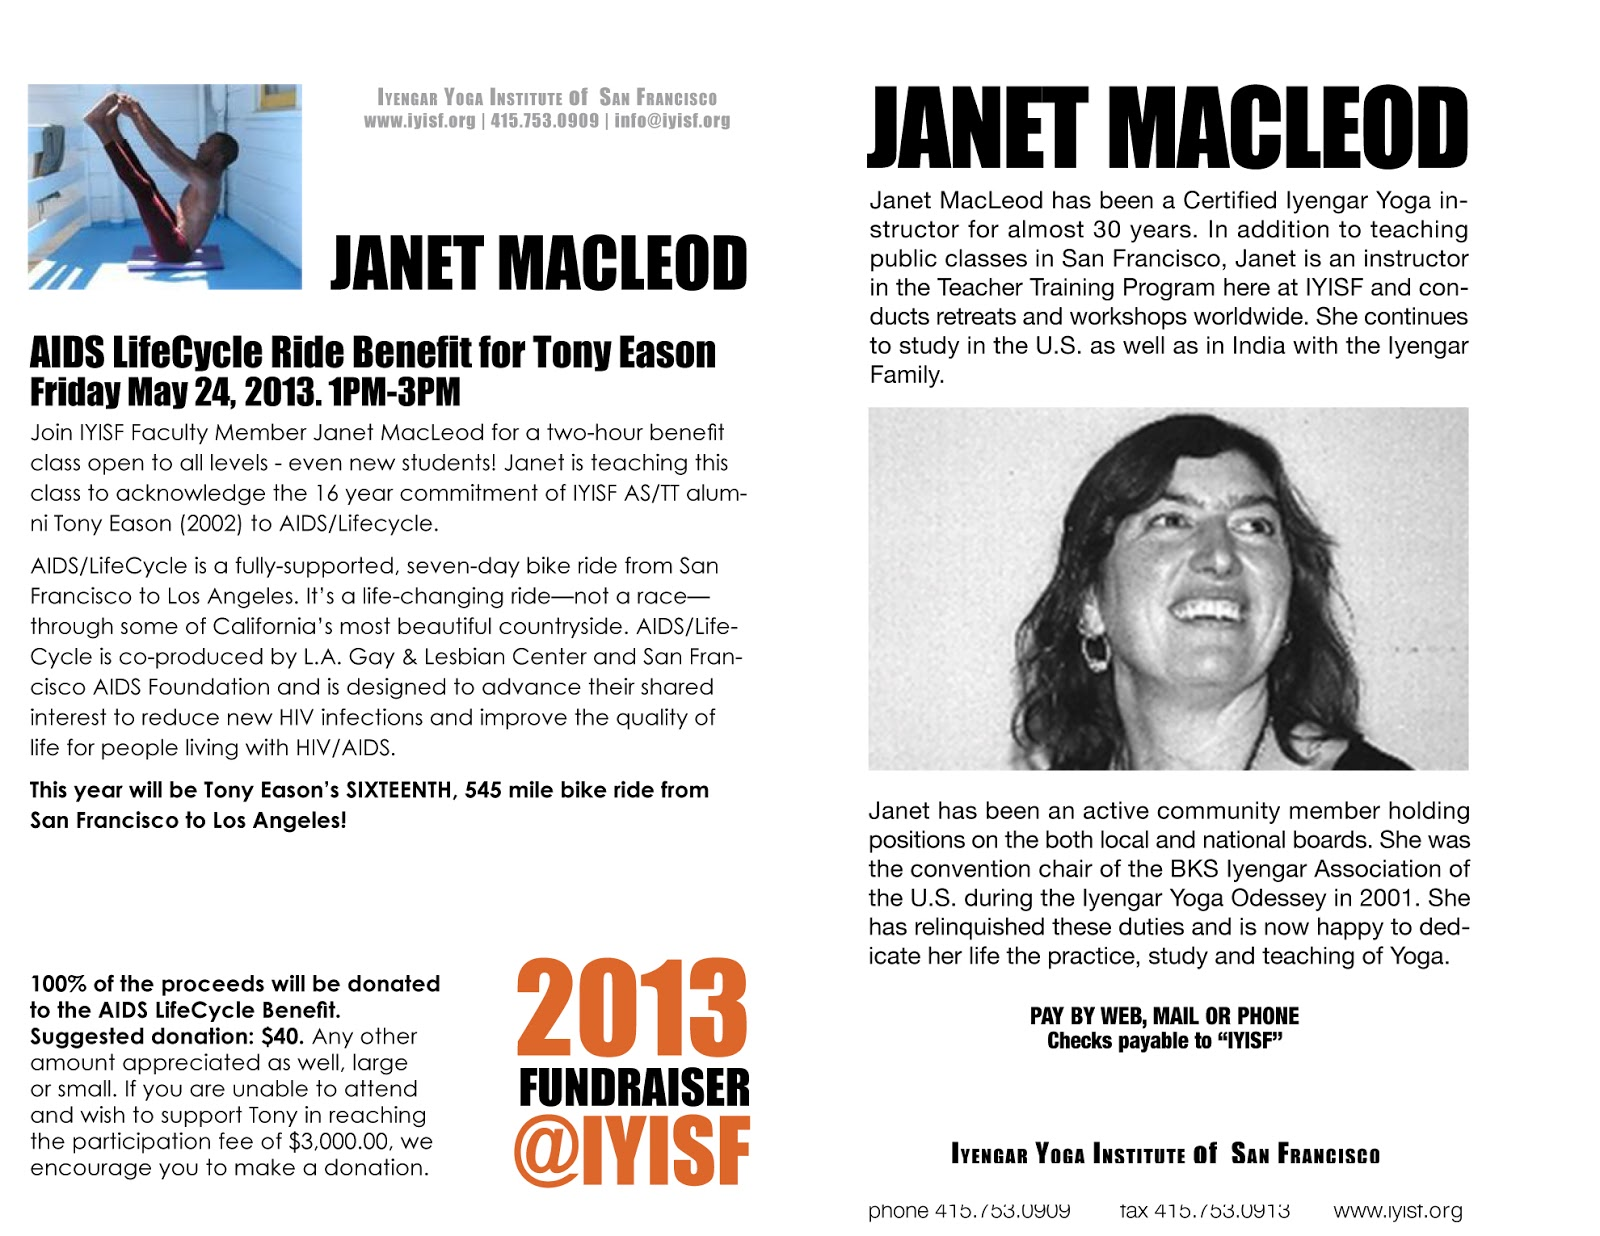 Face of Iyengar Yoga Teacher, Janet Macleod